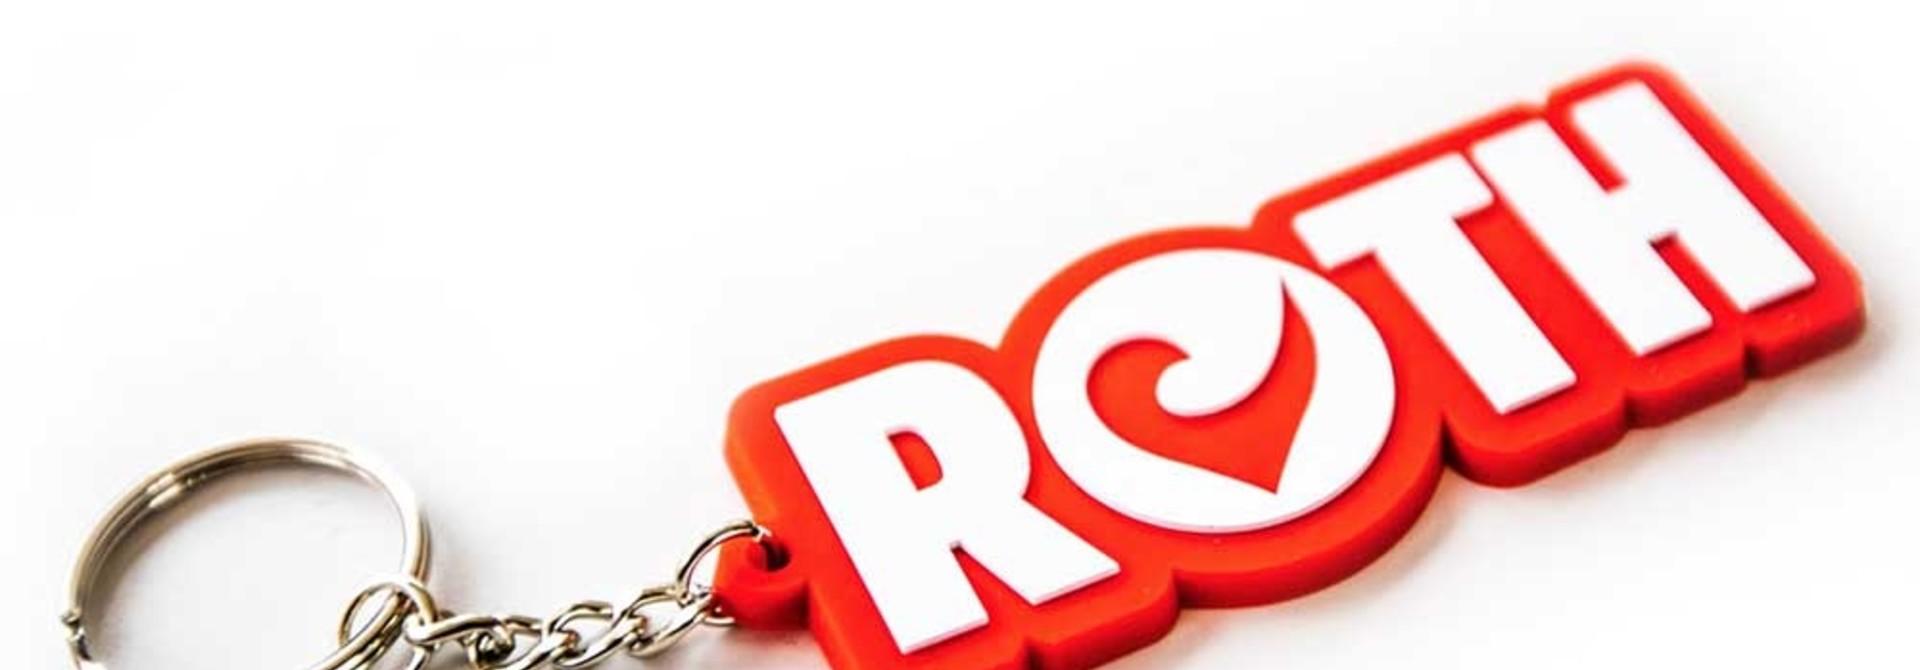 Key Chain ROTH